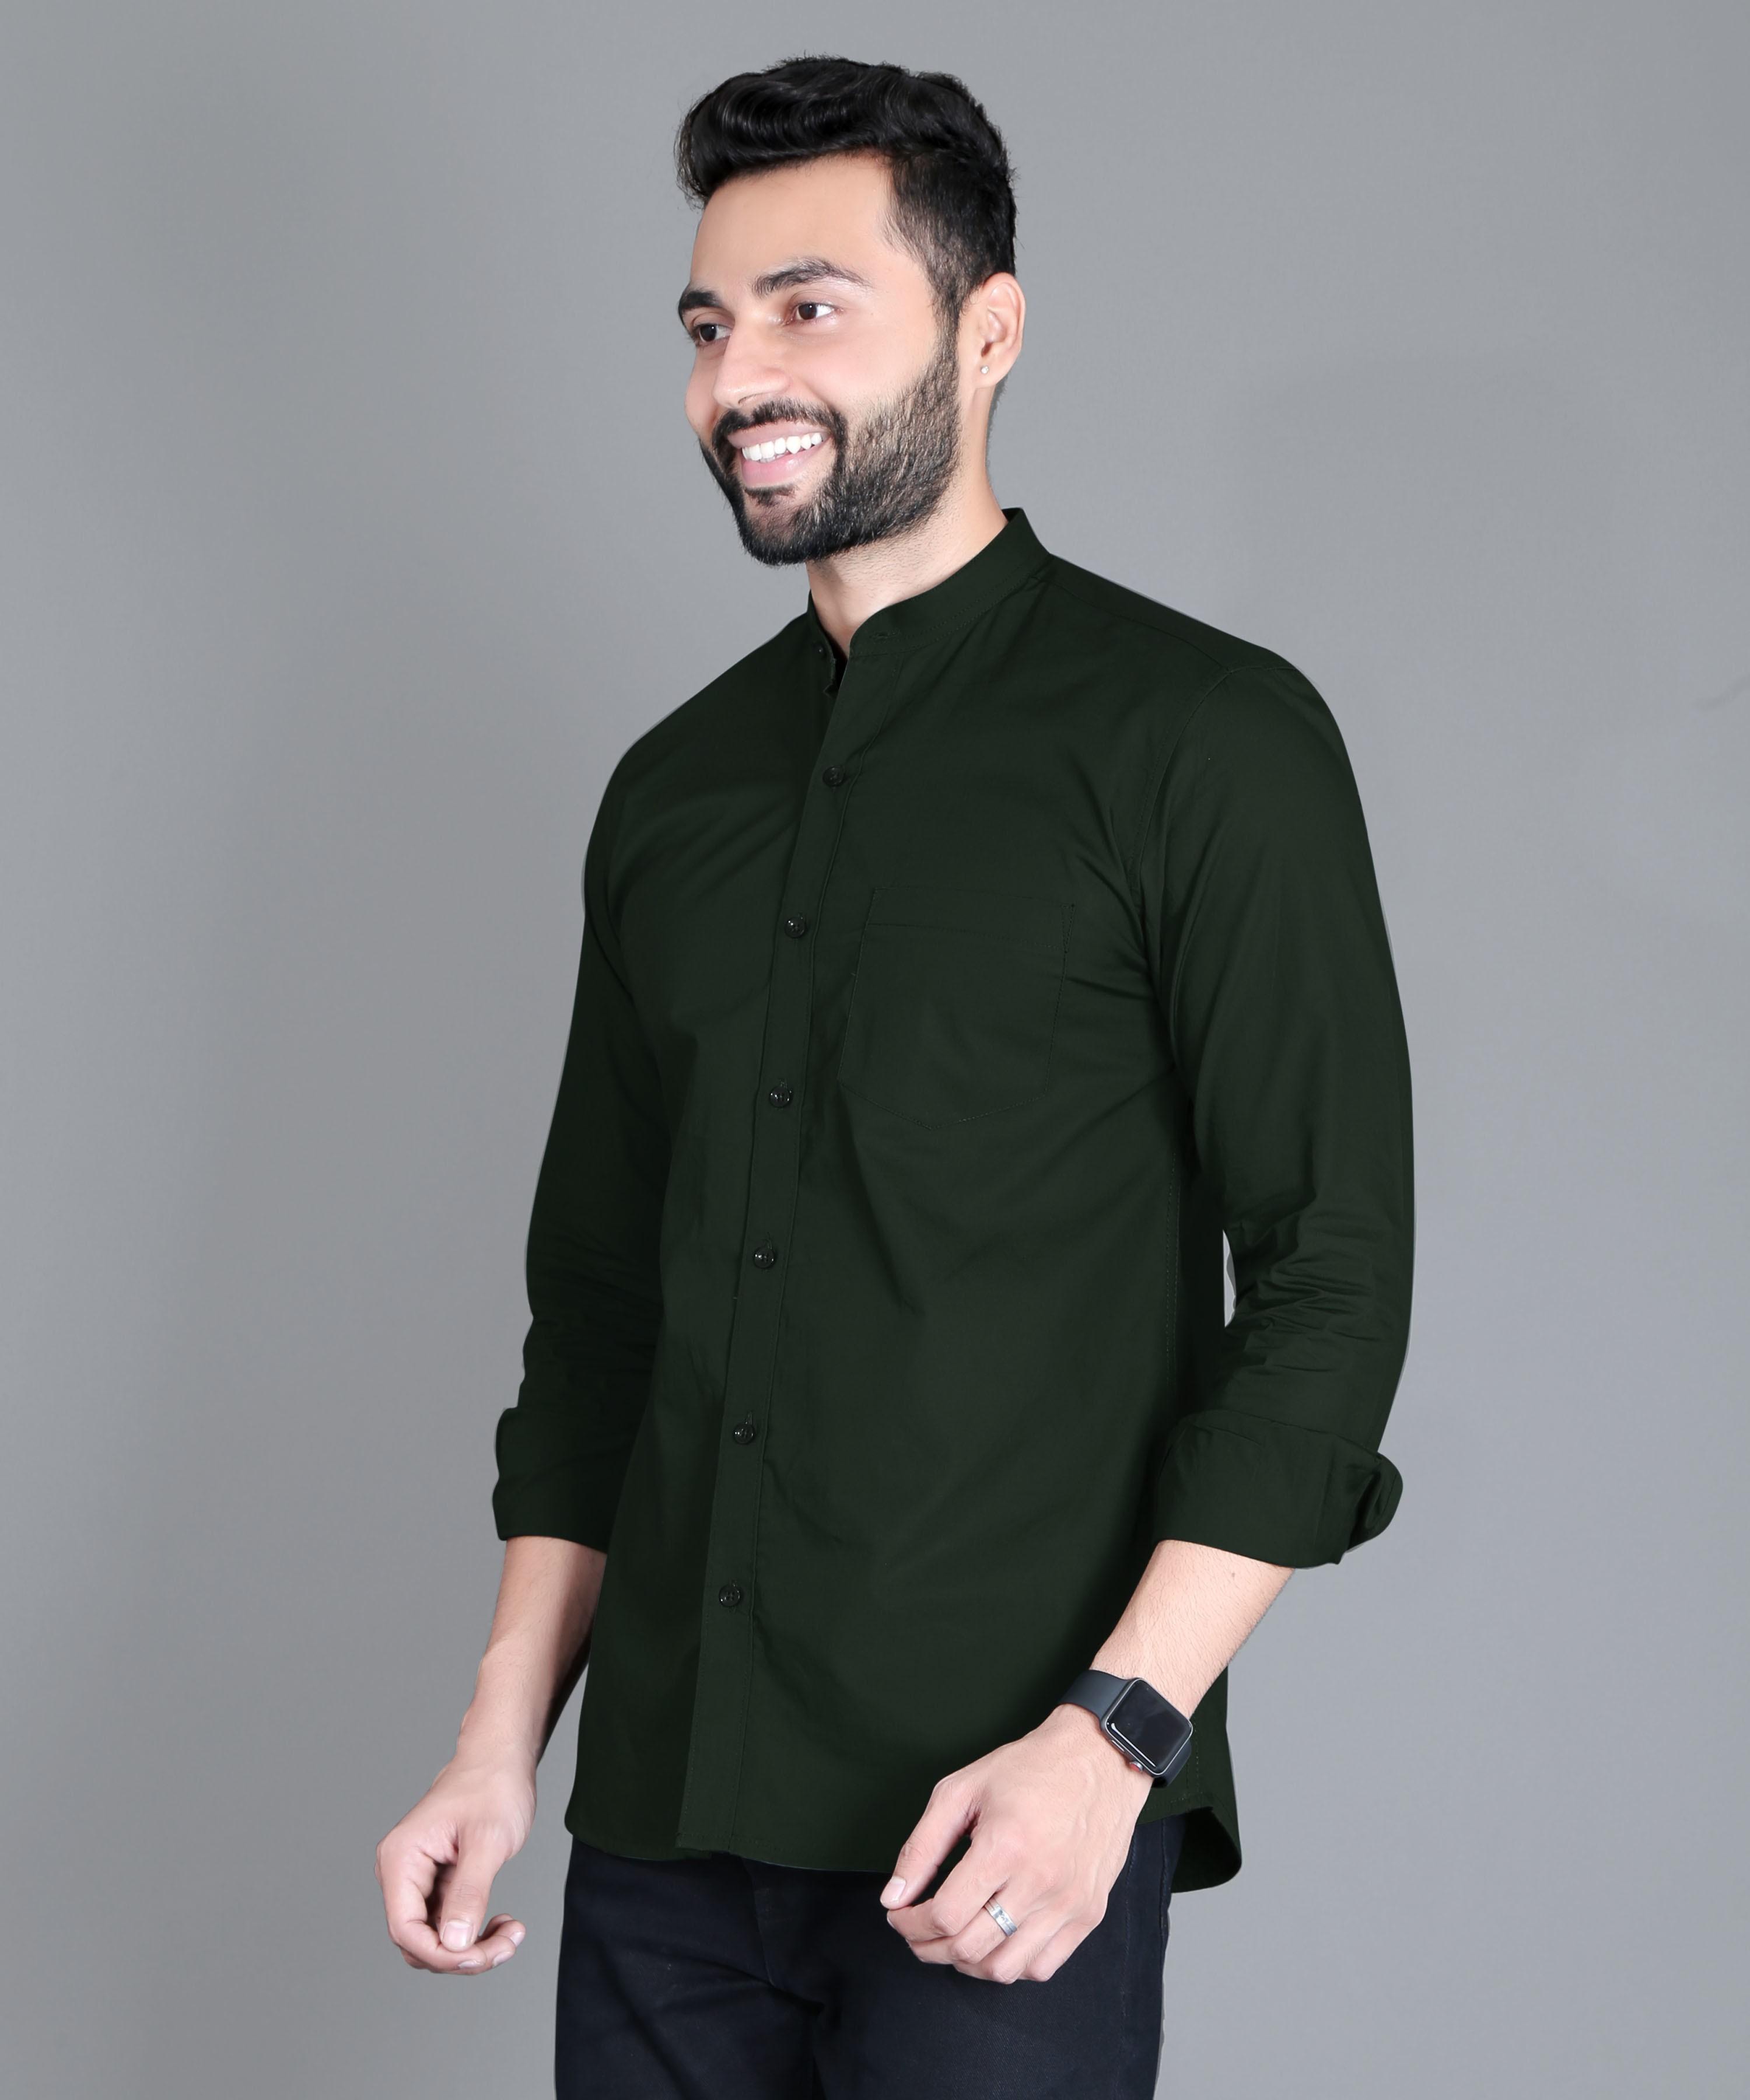 FIFTH ANFOLD Casual Mandrin Collar full Sleev/Long Sleev Bottle Green Pure Cotton Plain Solid Men Shirt